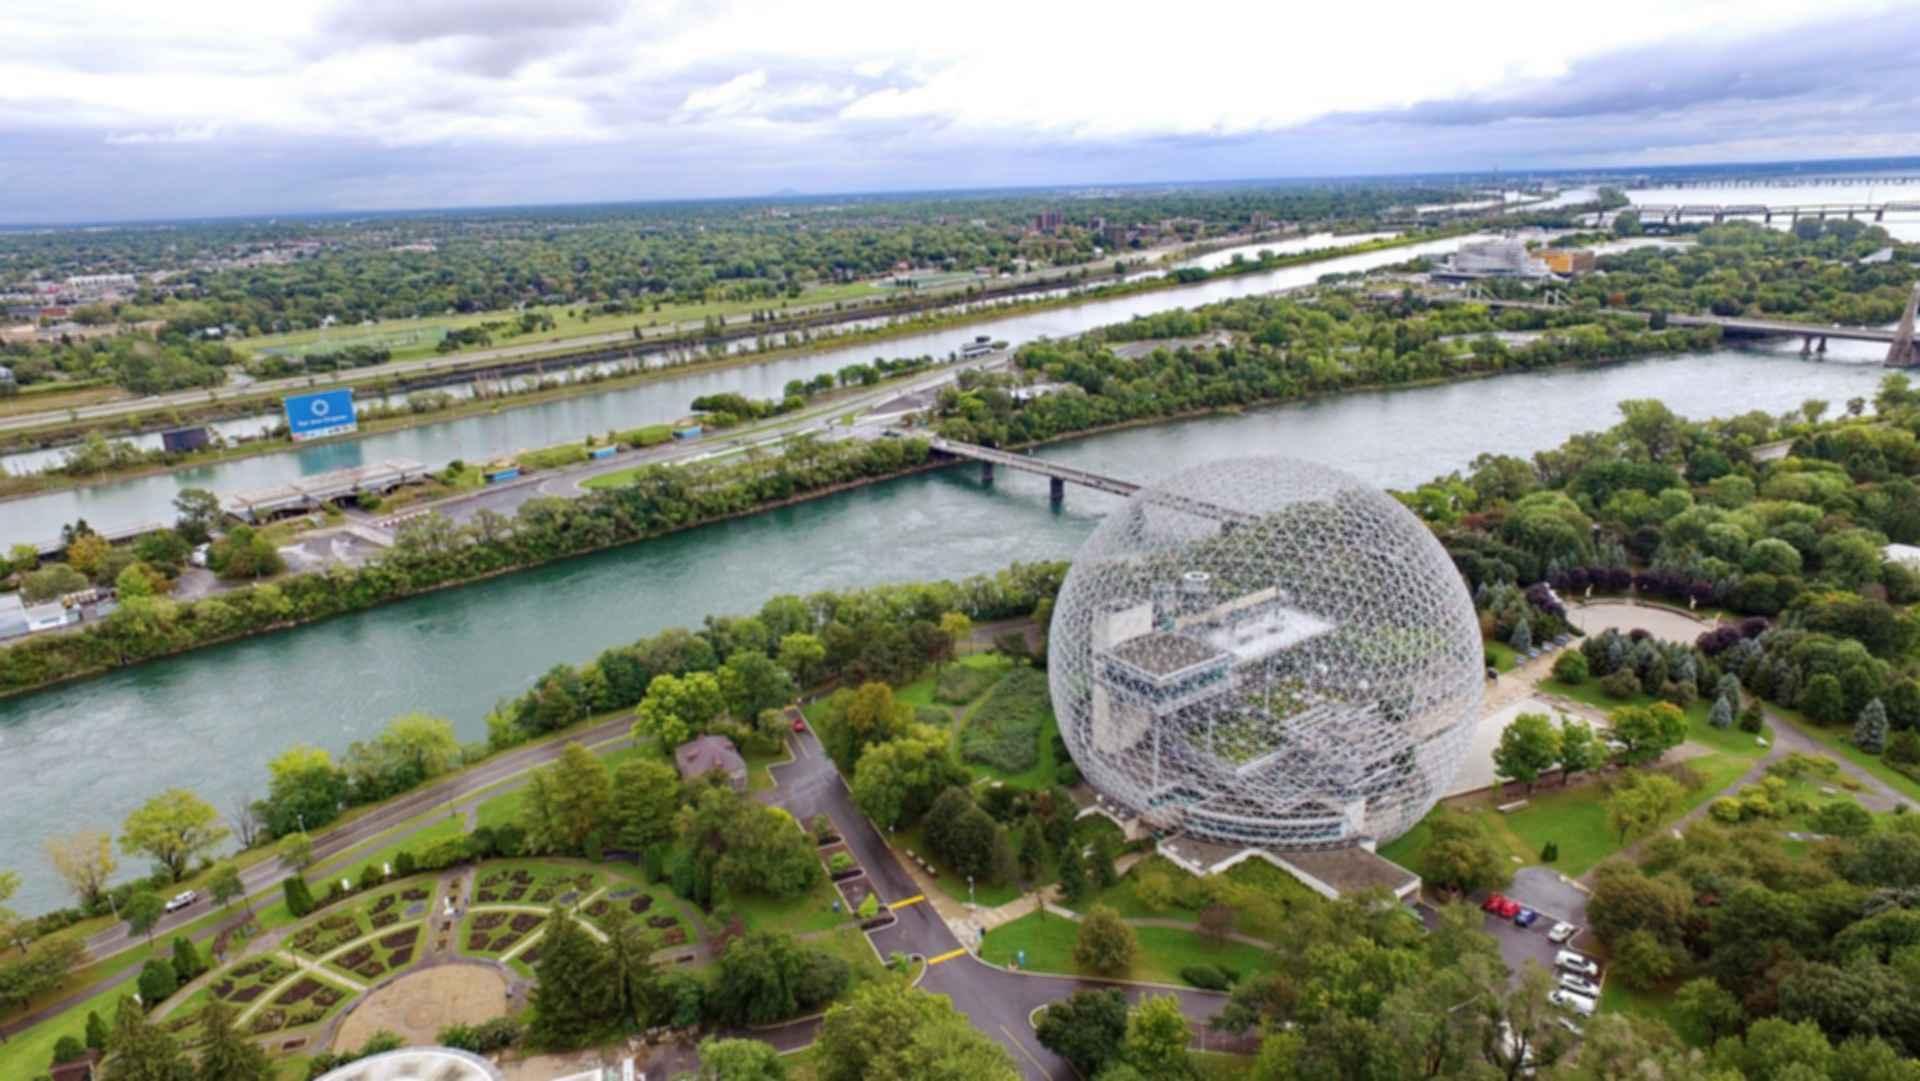 Montreal Biosphère - Bird's Eye View